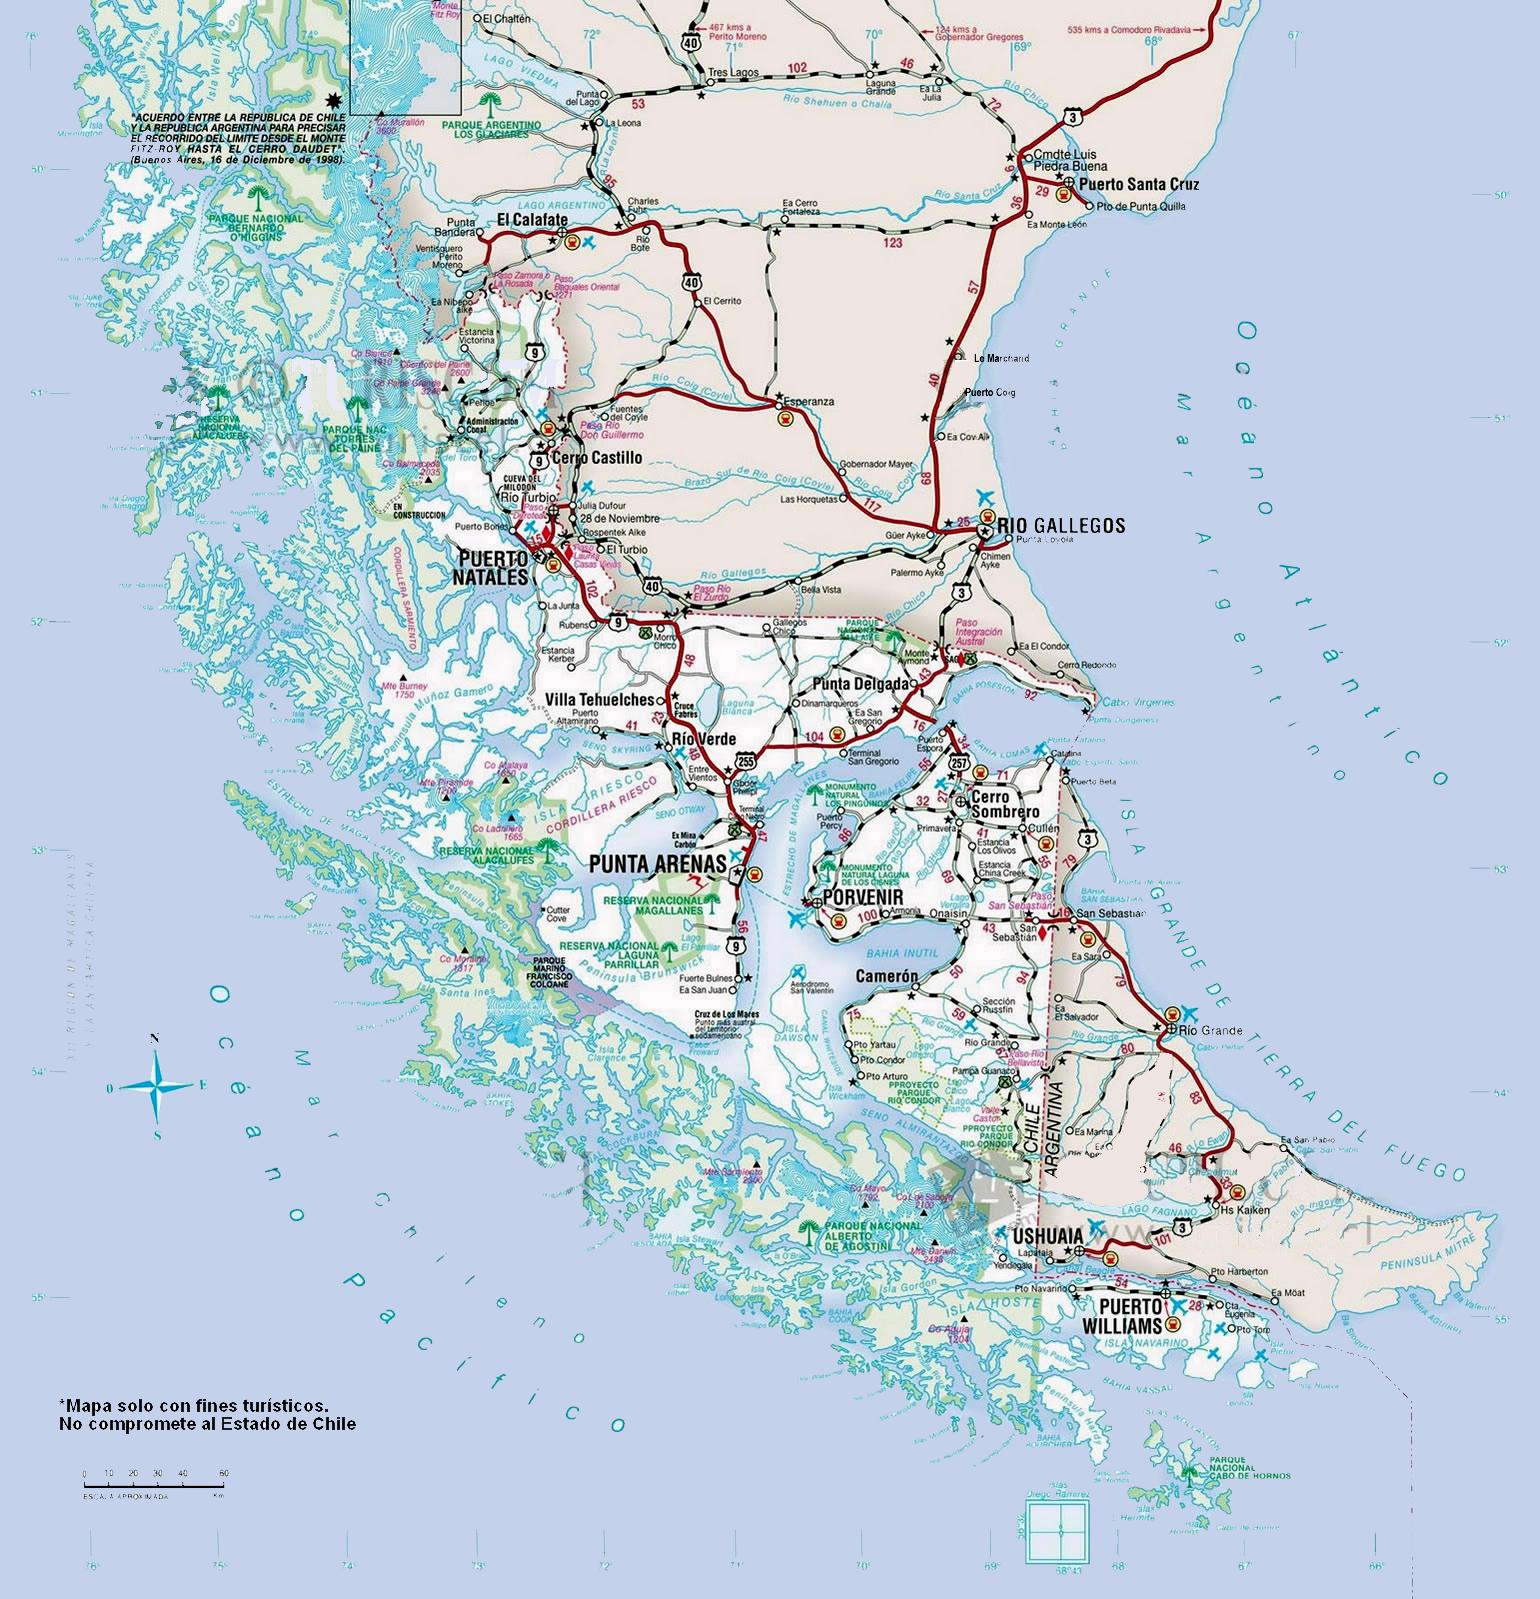 Circuito W Mapa : Pataleader operador turismo aventura patagonia chile